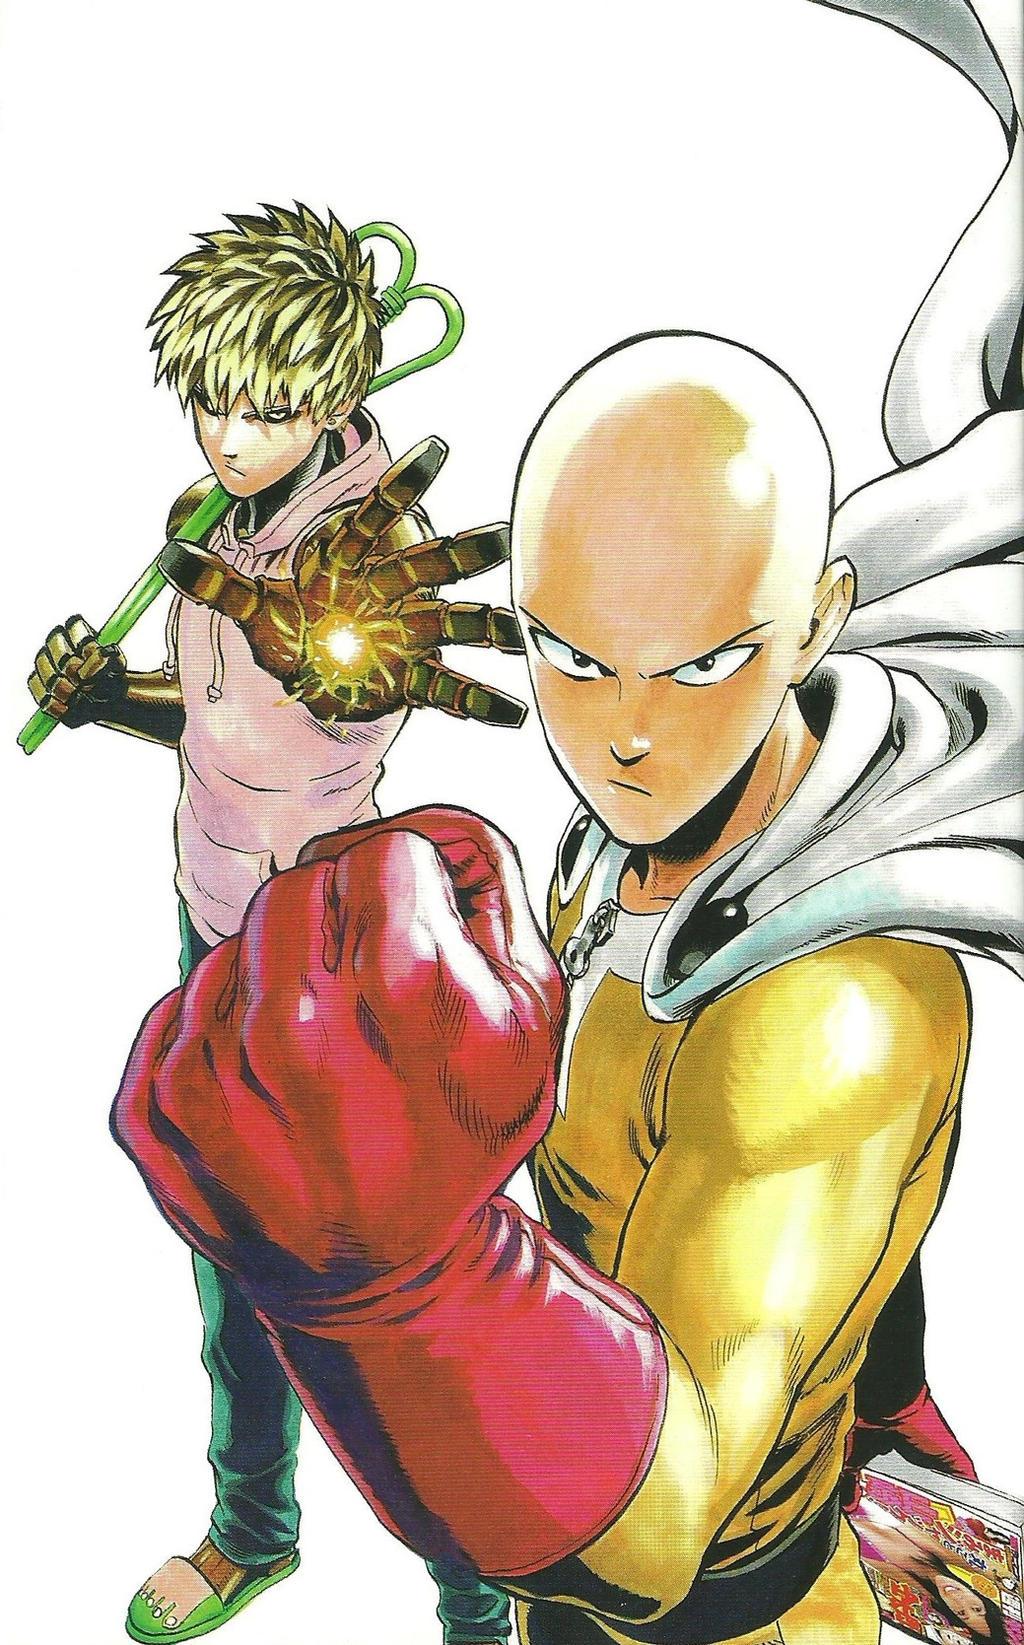 One Punch Man Saitama - One Punch Man Artwork Saitama Genos by corphish2 on DeviantArt